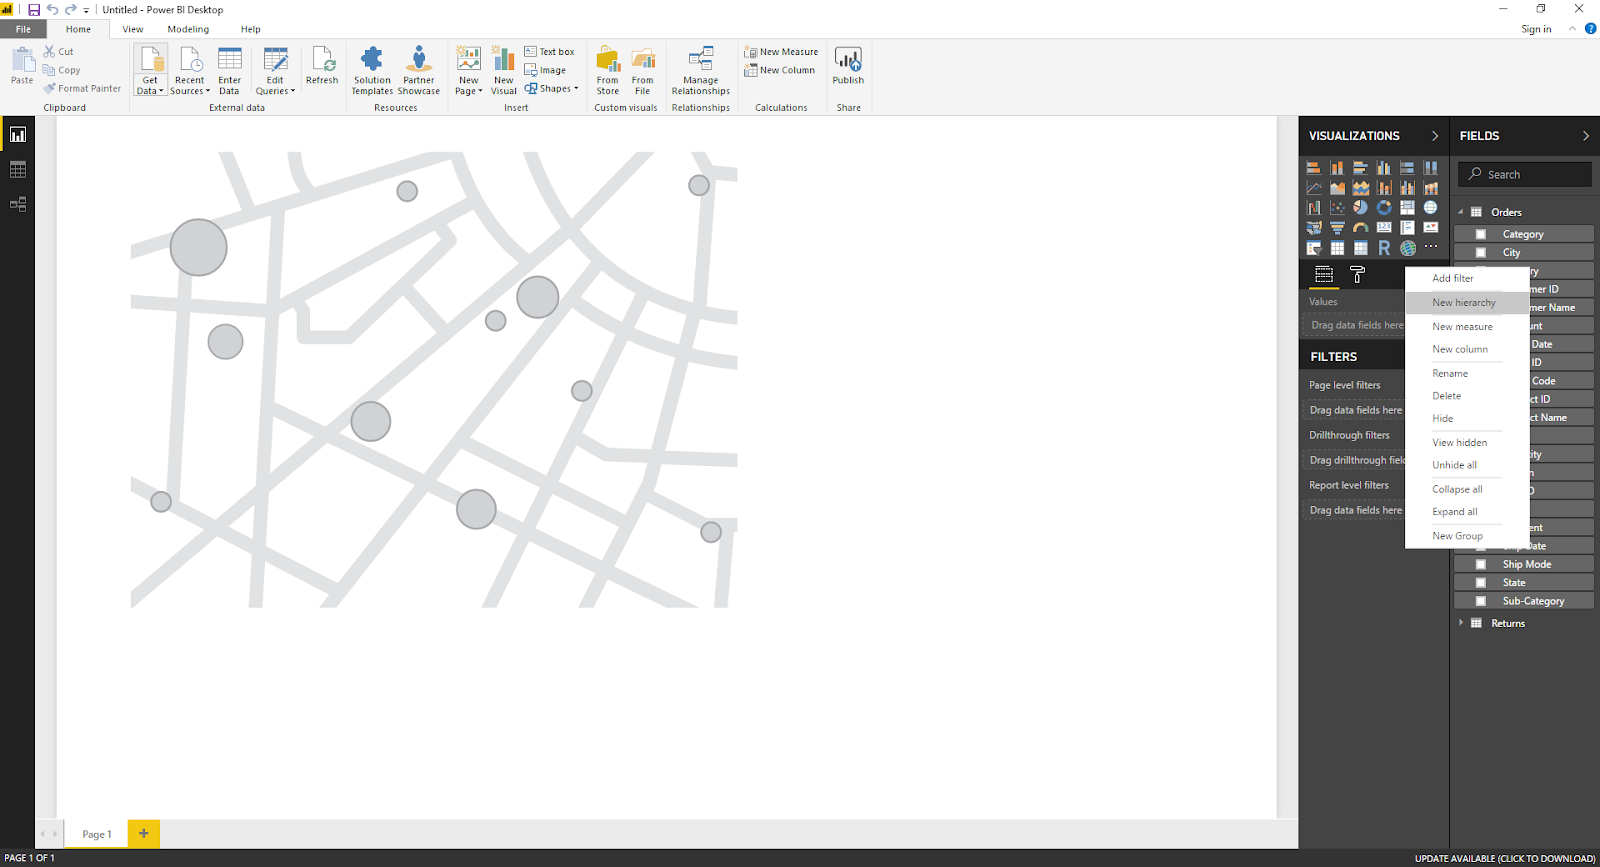 Maps & Hierarchy in Microsoft Power BI 31